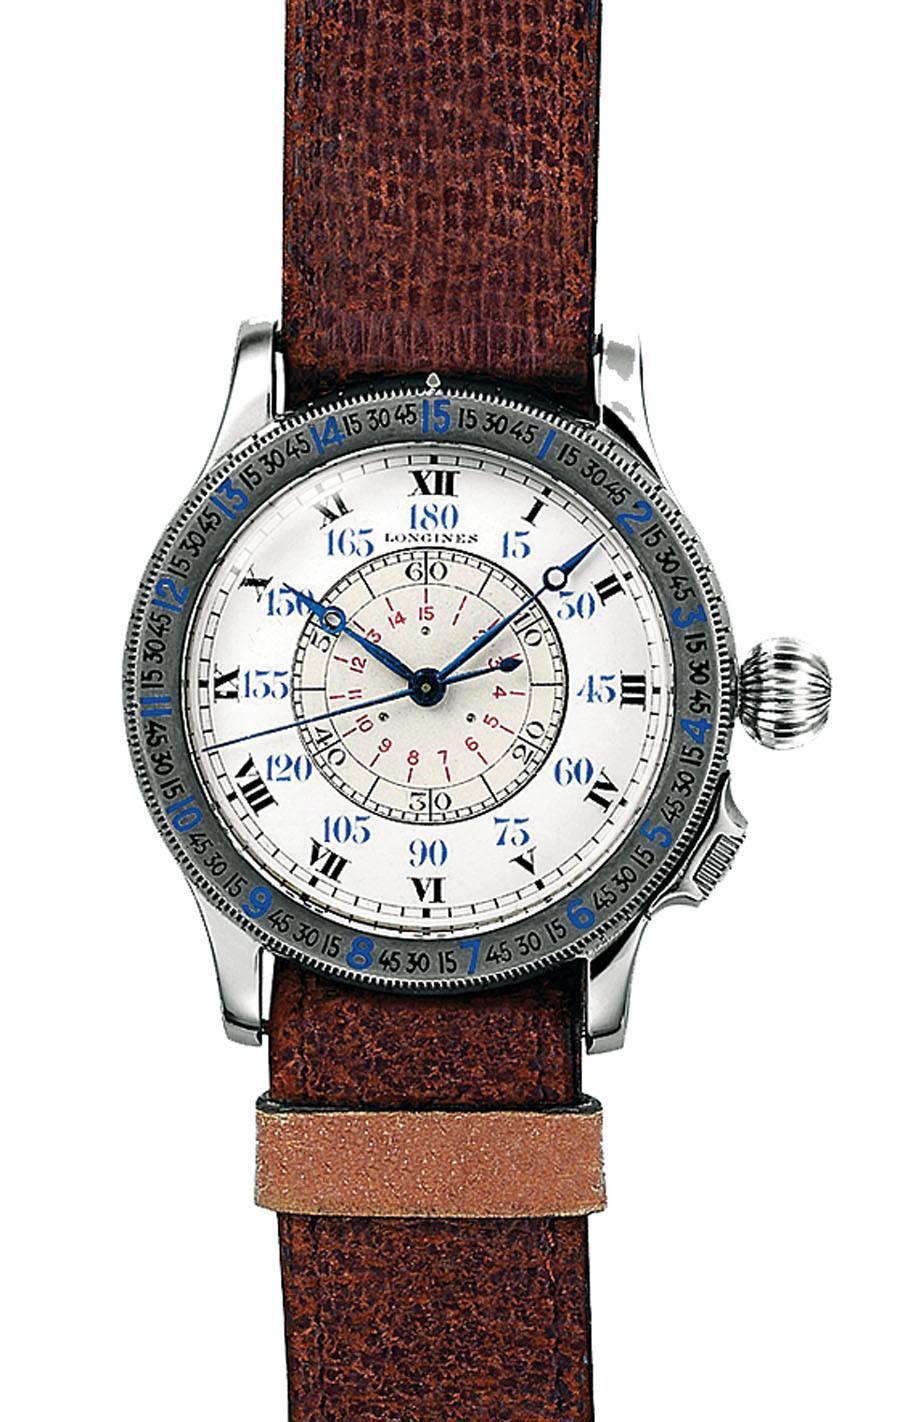 Replik Hublot Uhren